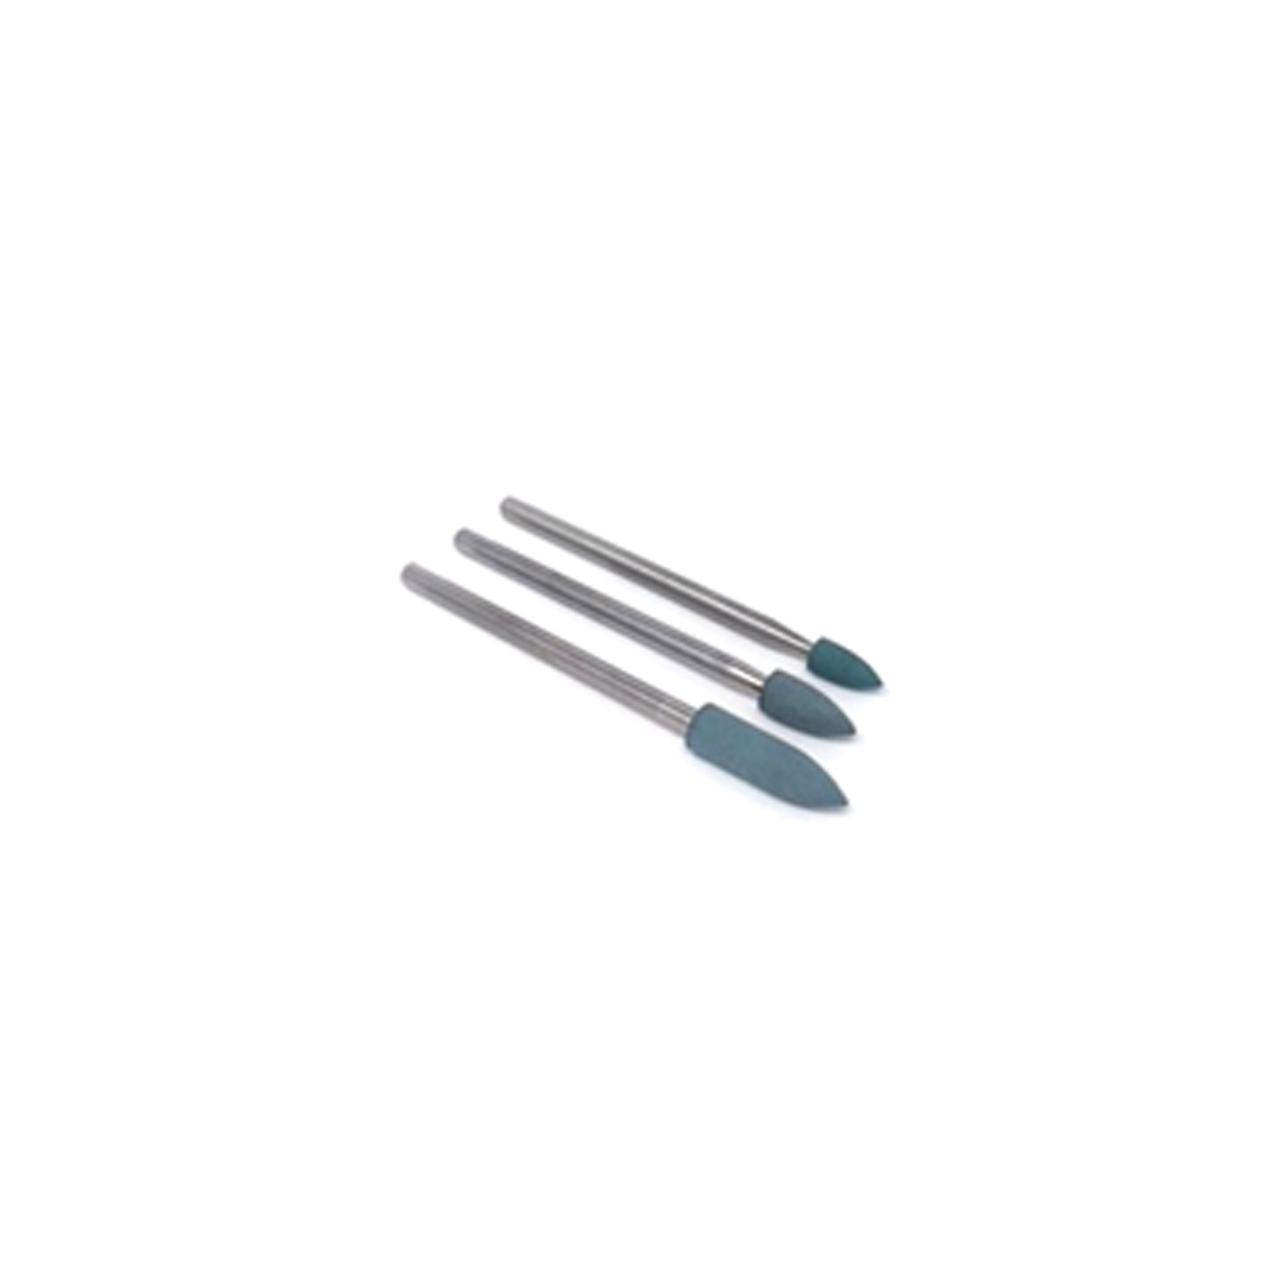 Silicone Polishing Tip Set - Green Super Fine Grit (3pcs)